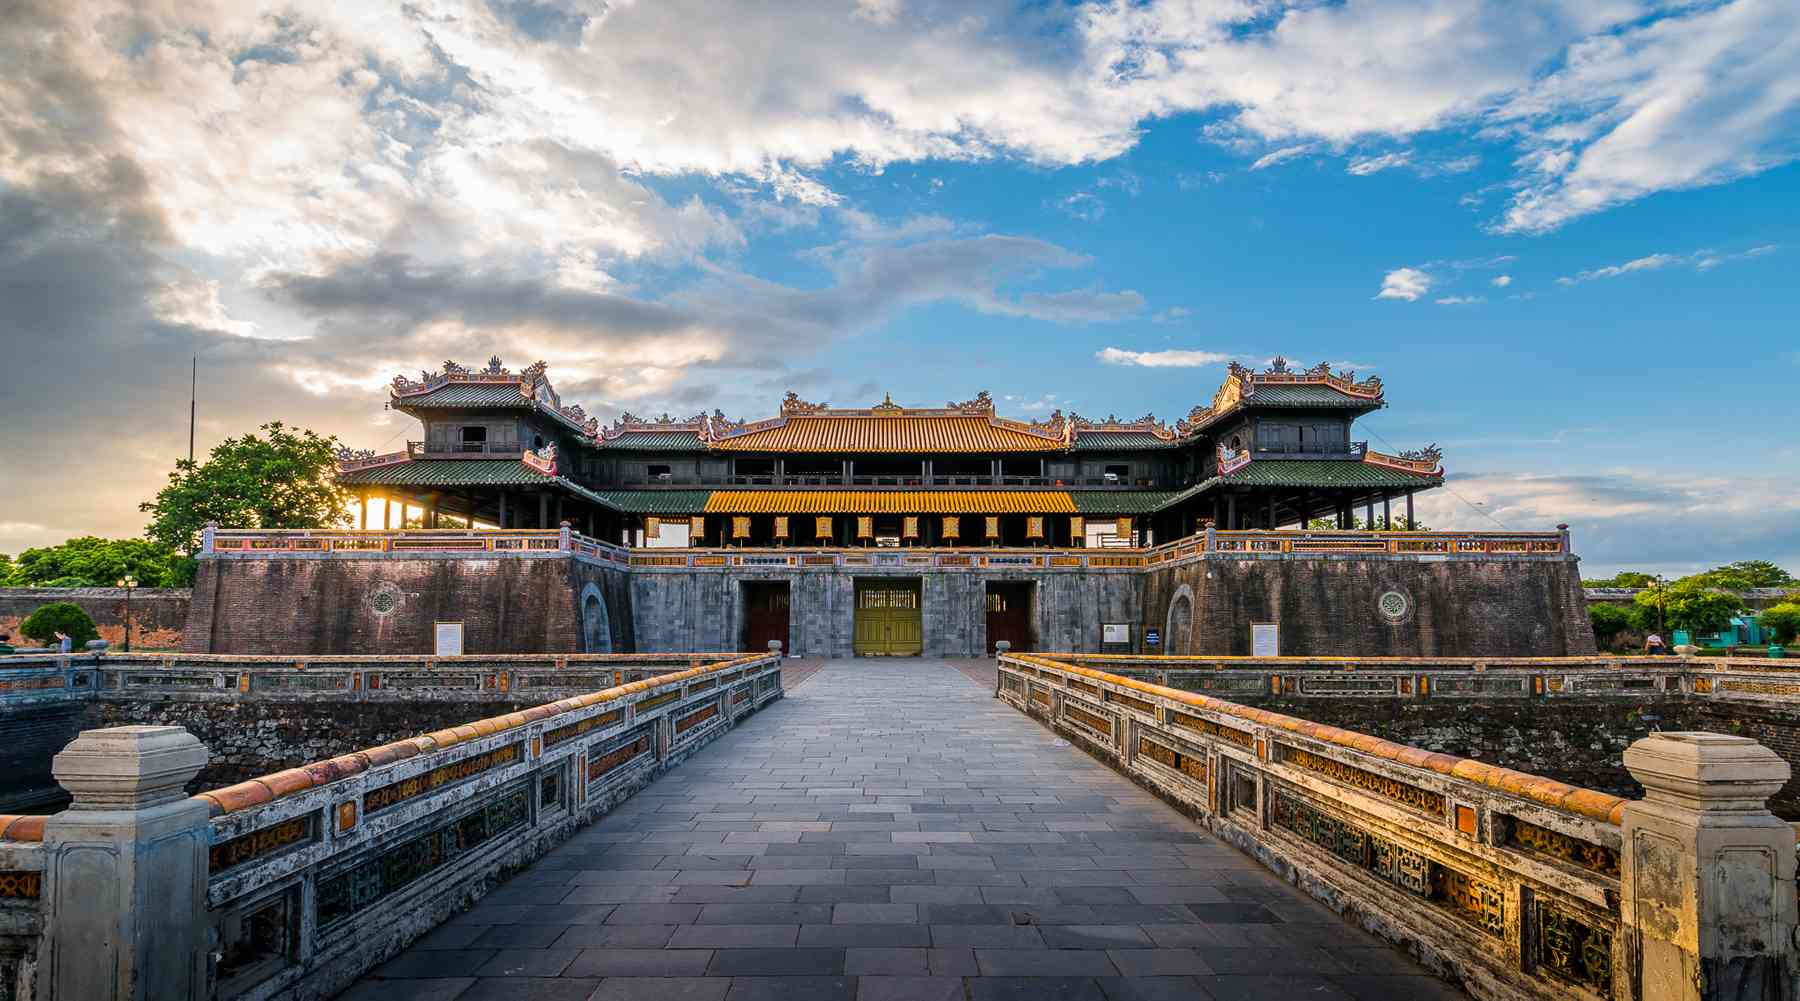 Hue Citadel en de verboden stad